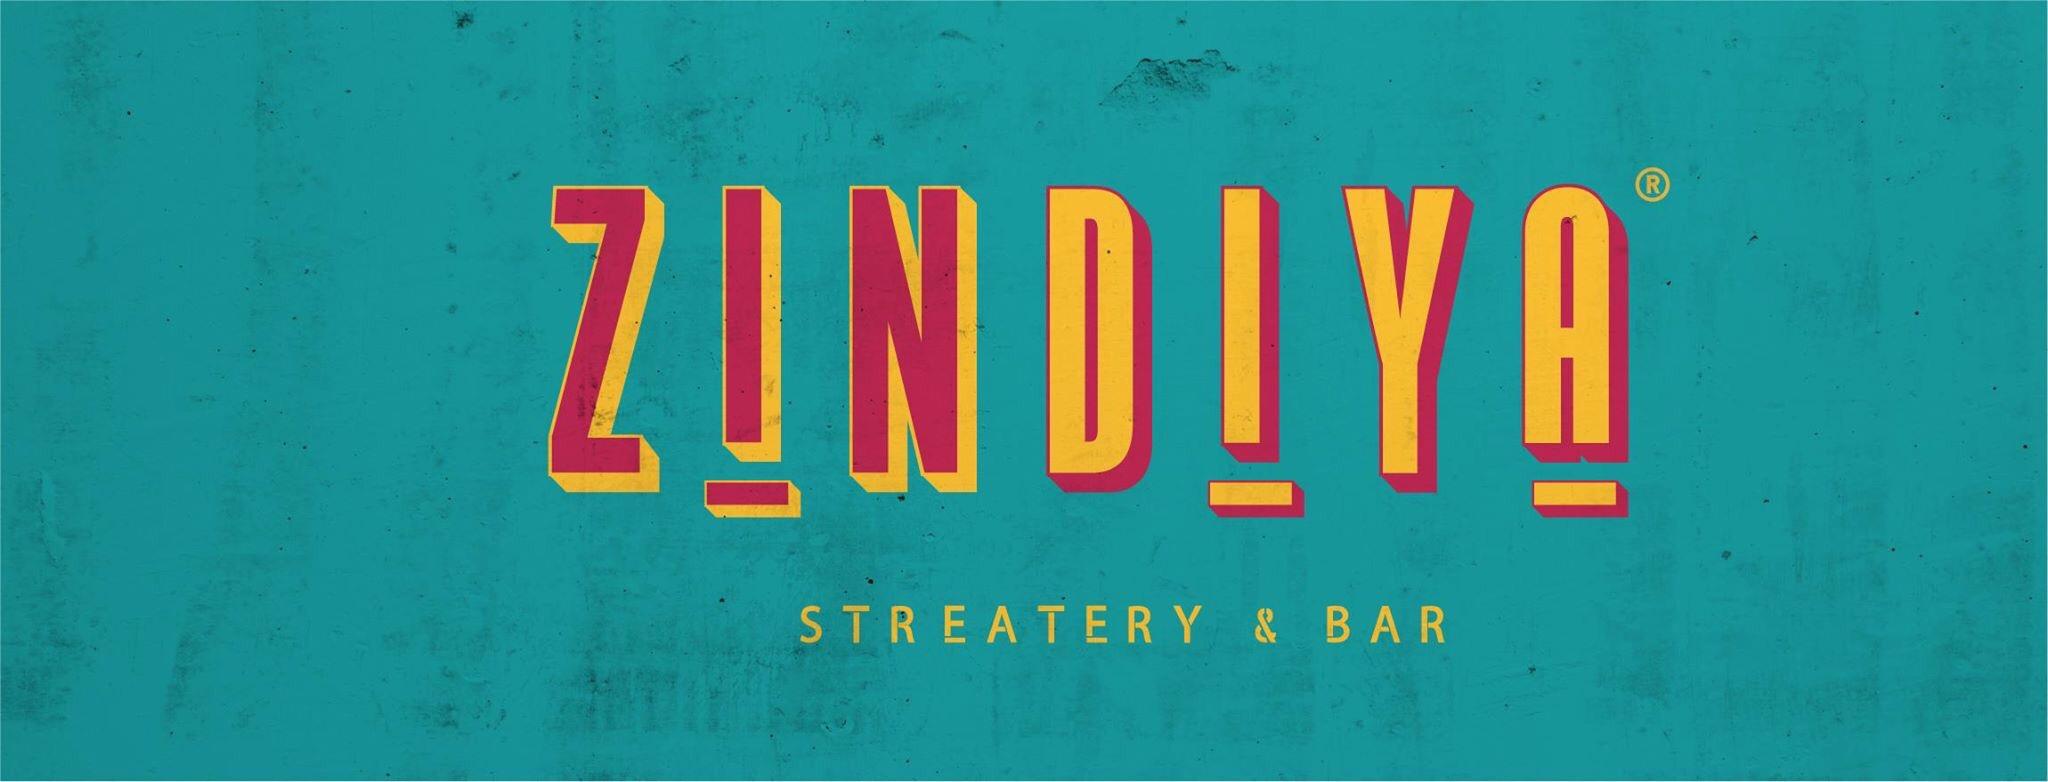 New Indian Streetfood Restaurant Zindiya Set To Bring Colour